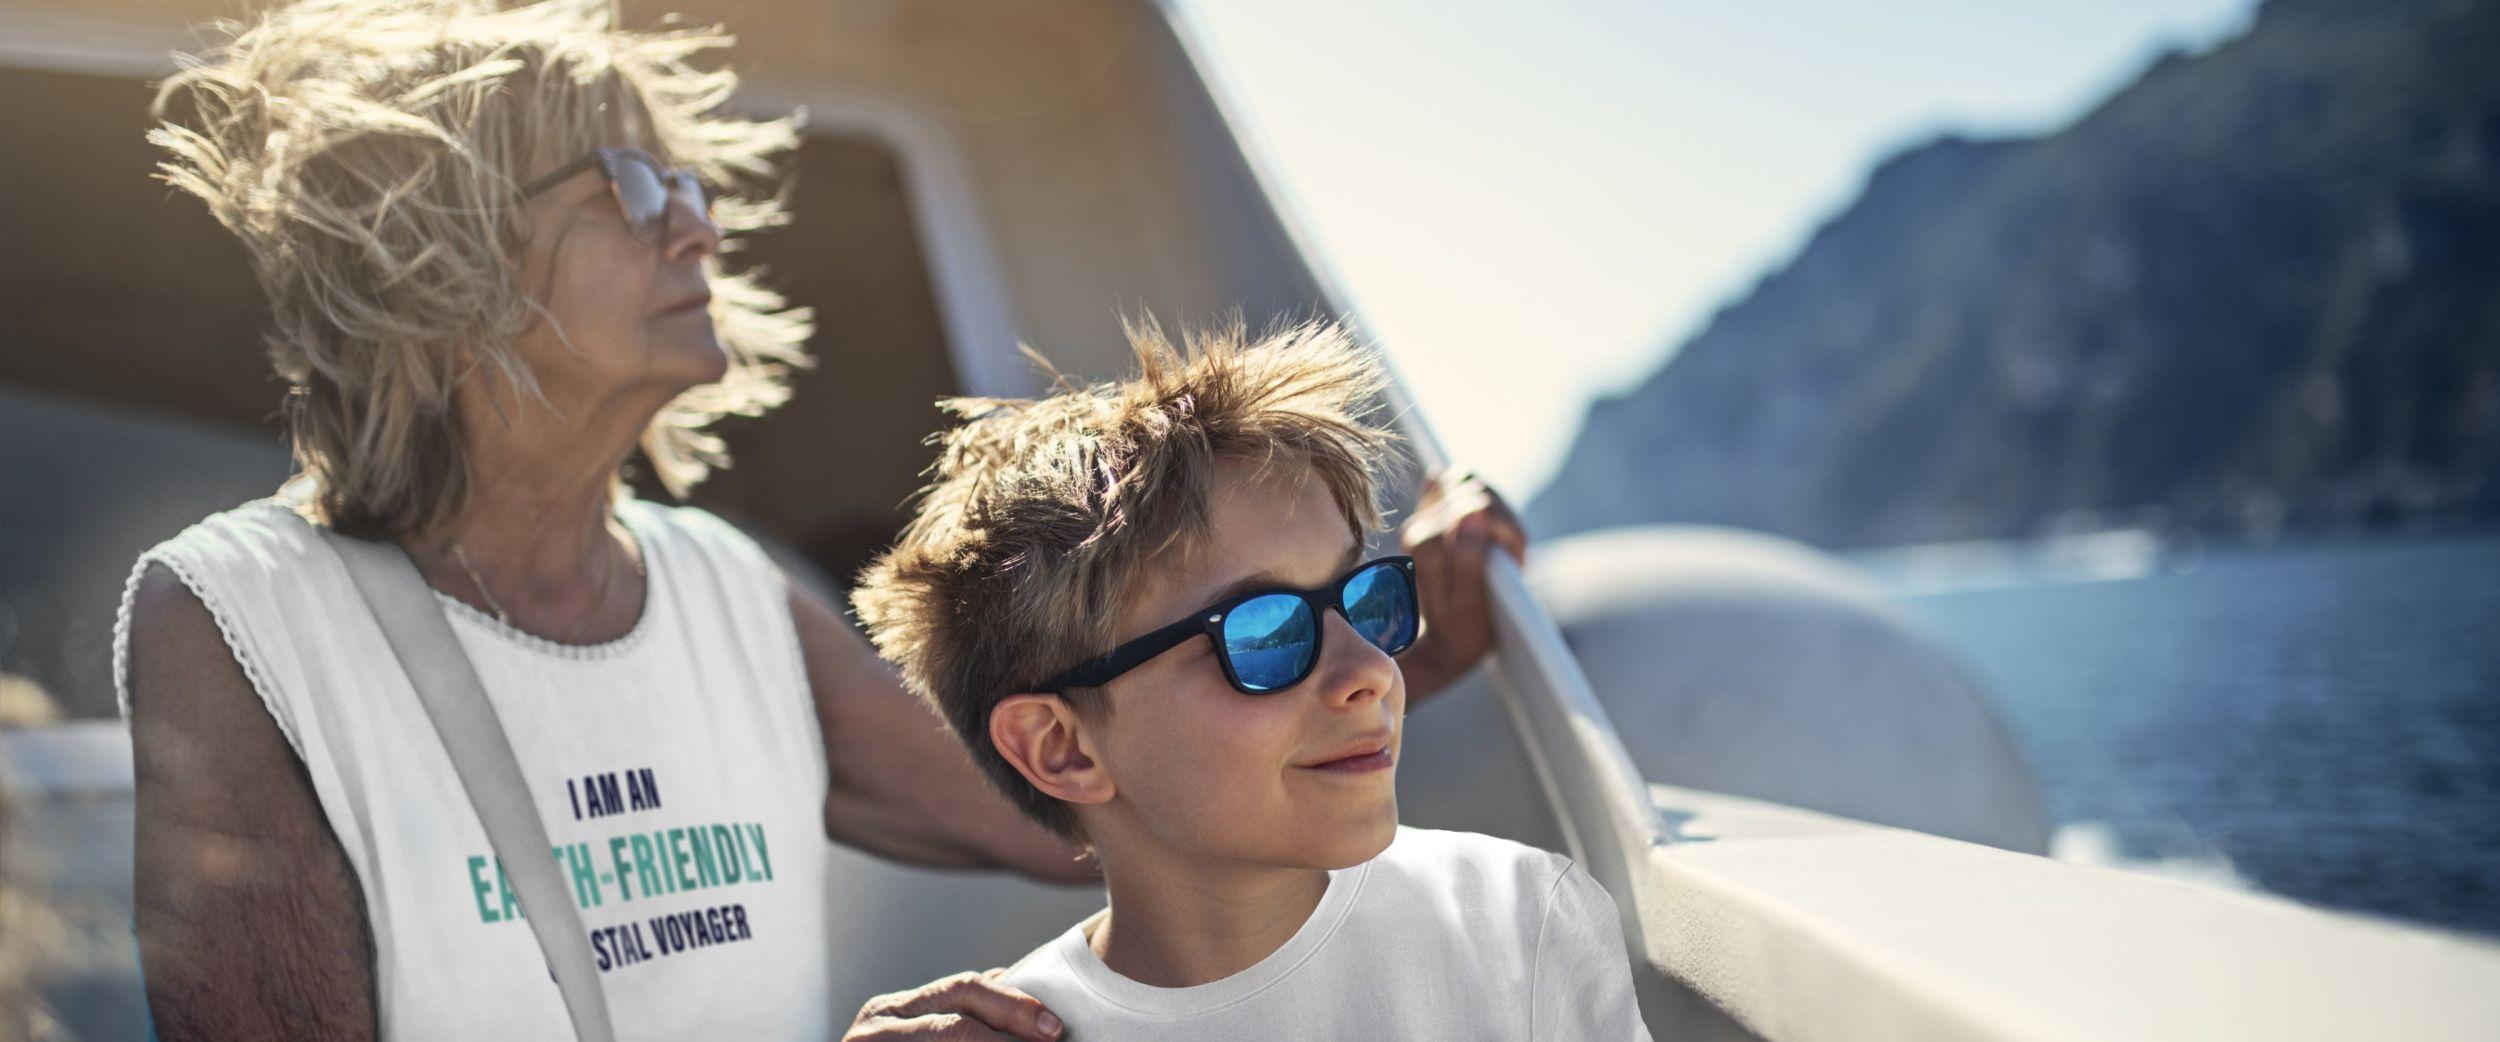 Grandma and grandchildren with earth-friendly coastal voyager t-shirts. Getty/Havila.